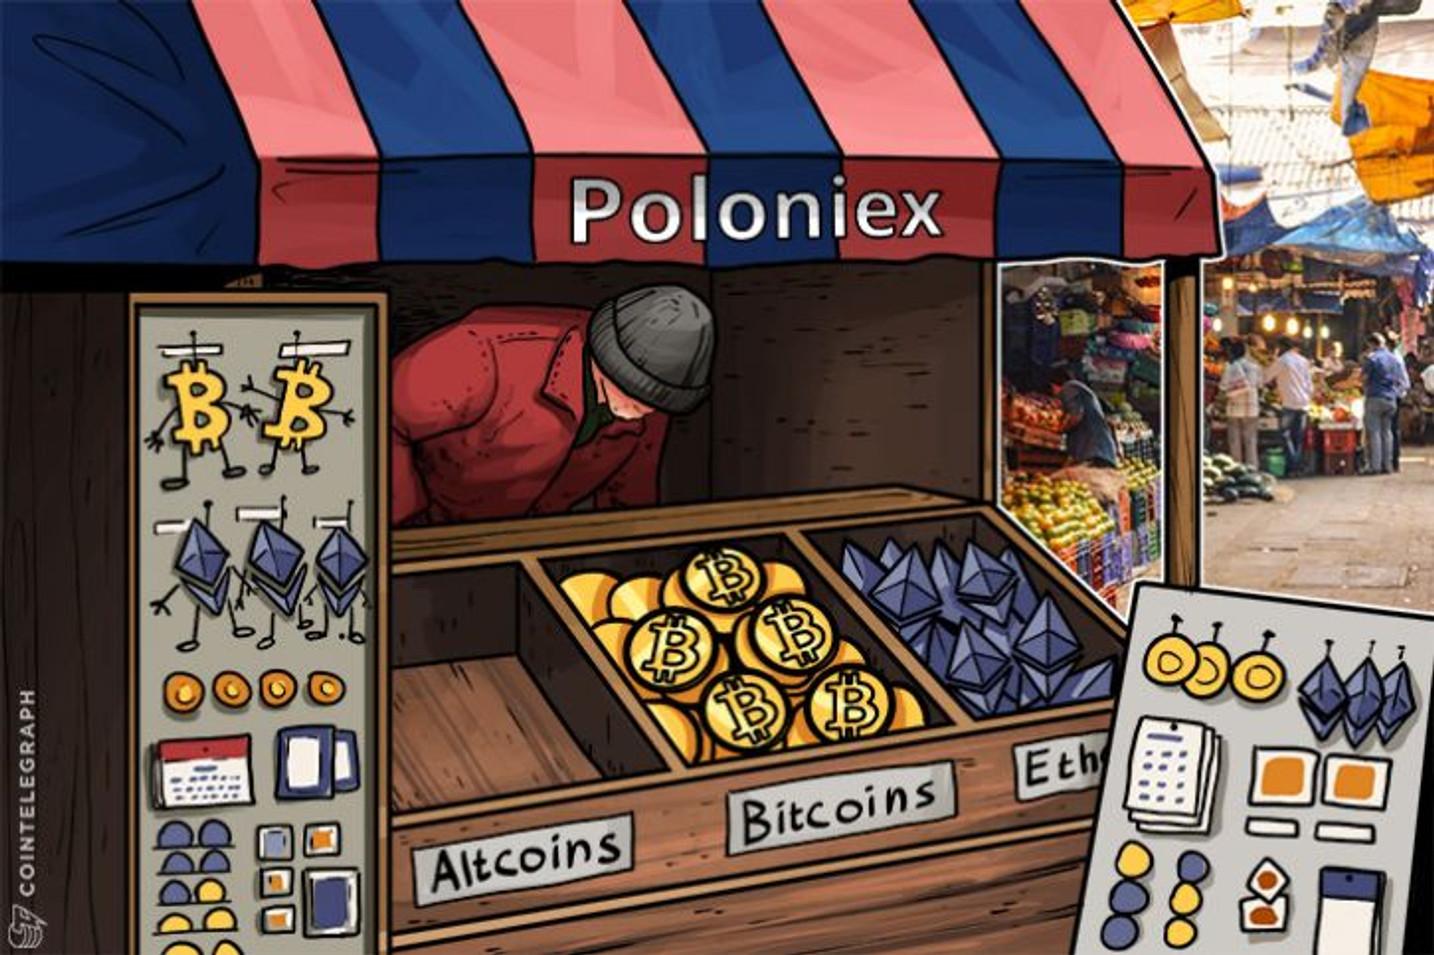 Poloniex Displaying Incorrect Customer Balances, Experiences Customer Service Woes